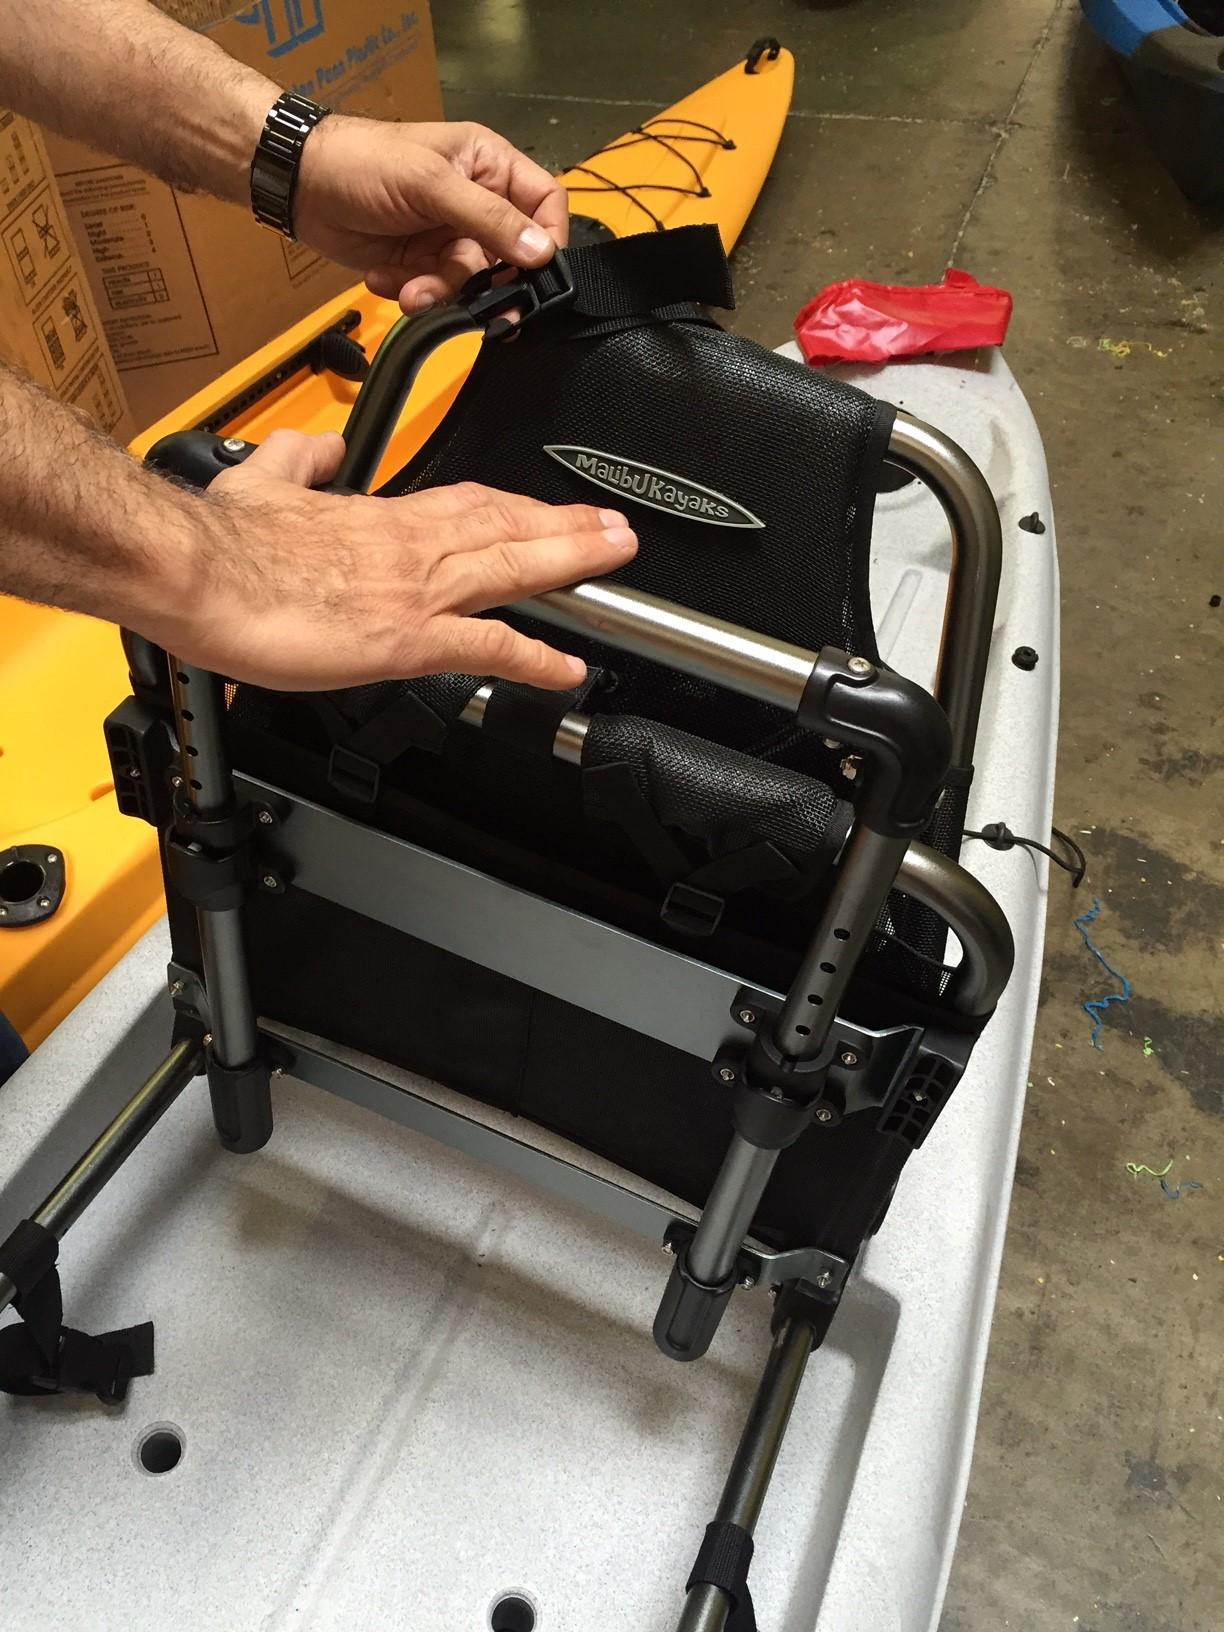 push back chair white leather club malibu kayaks x seat